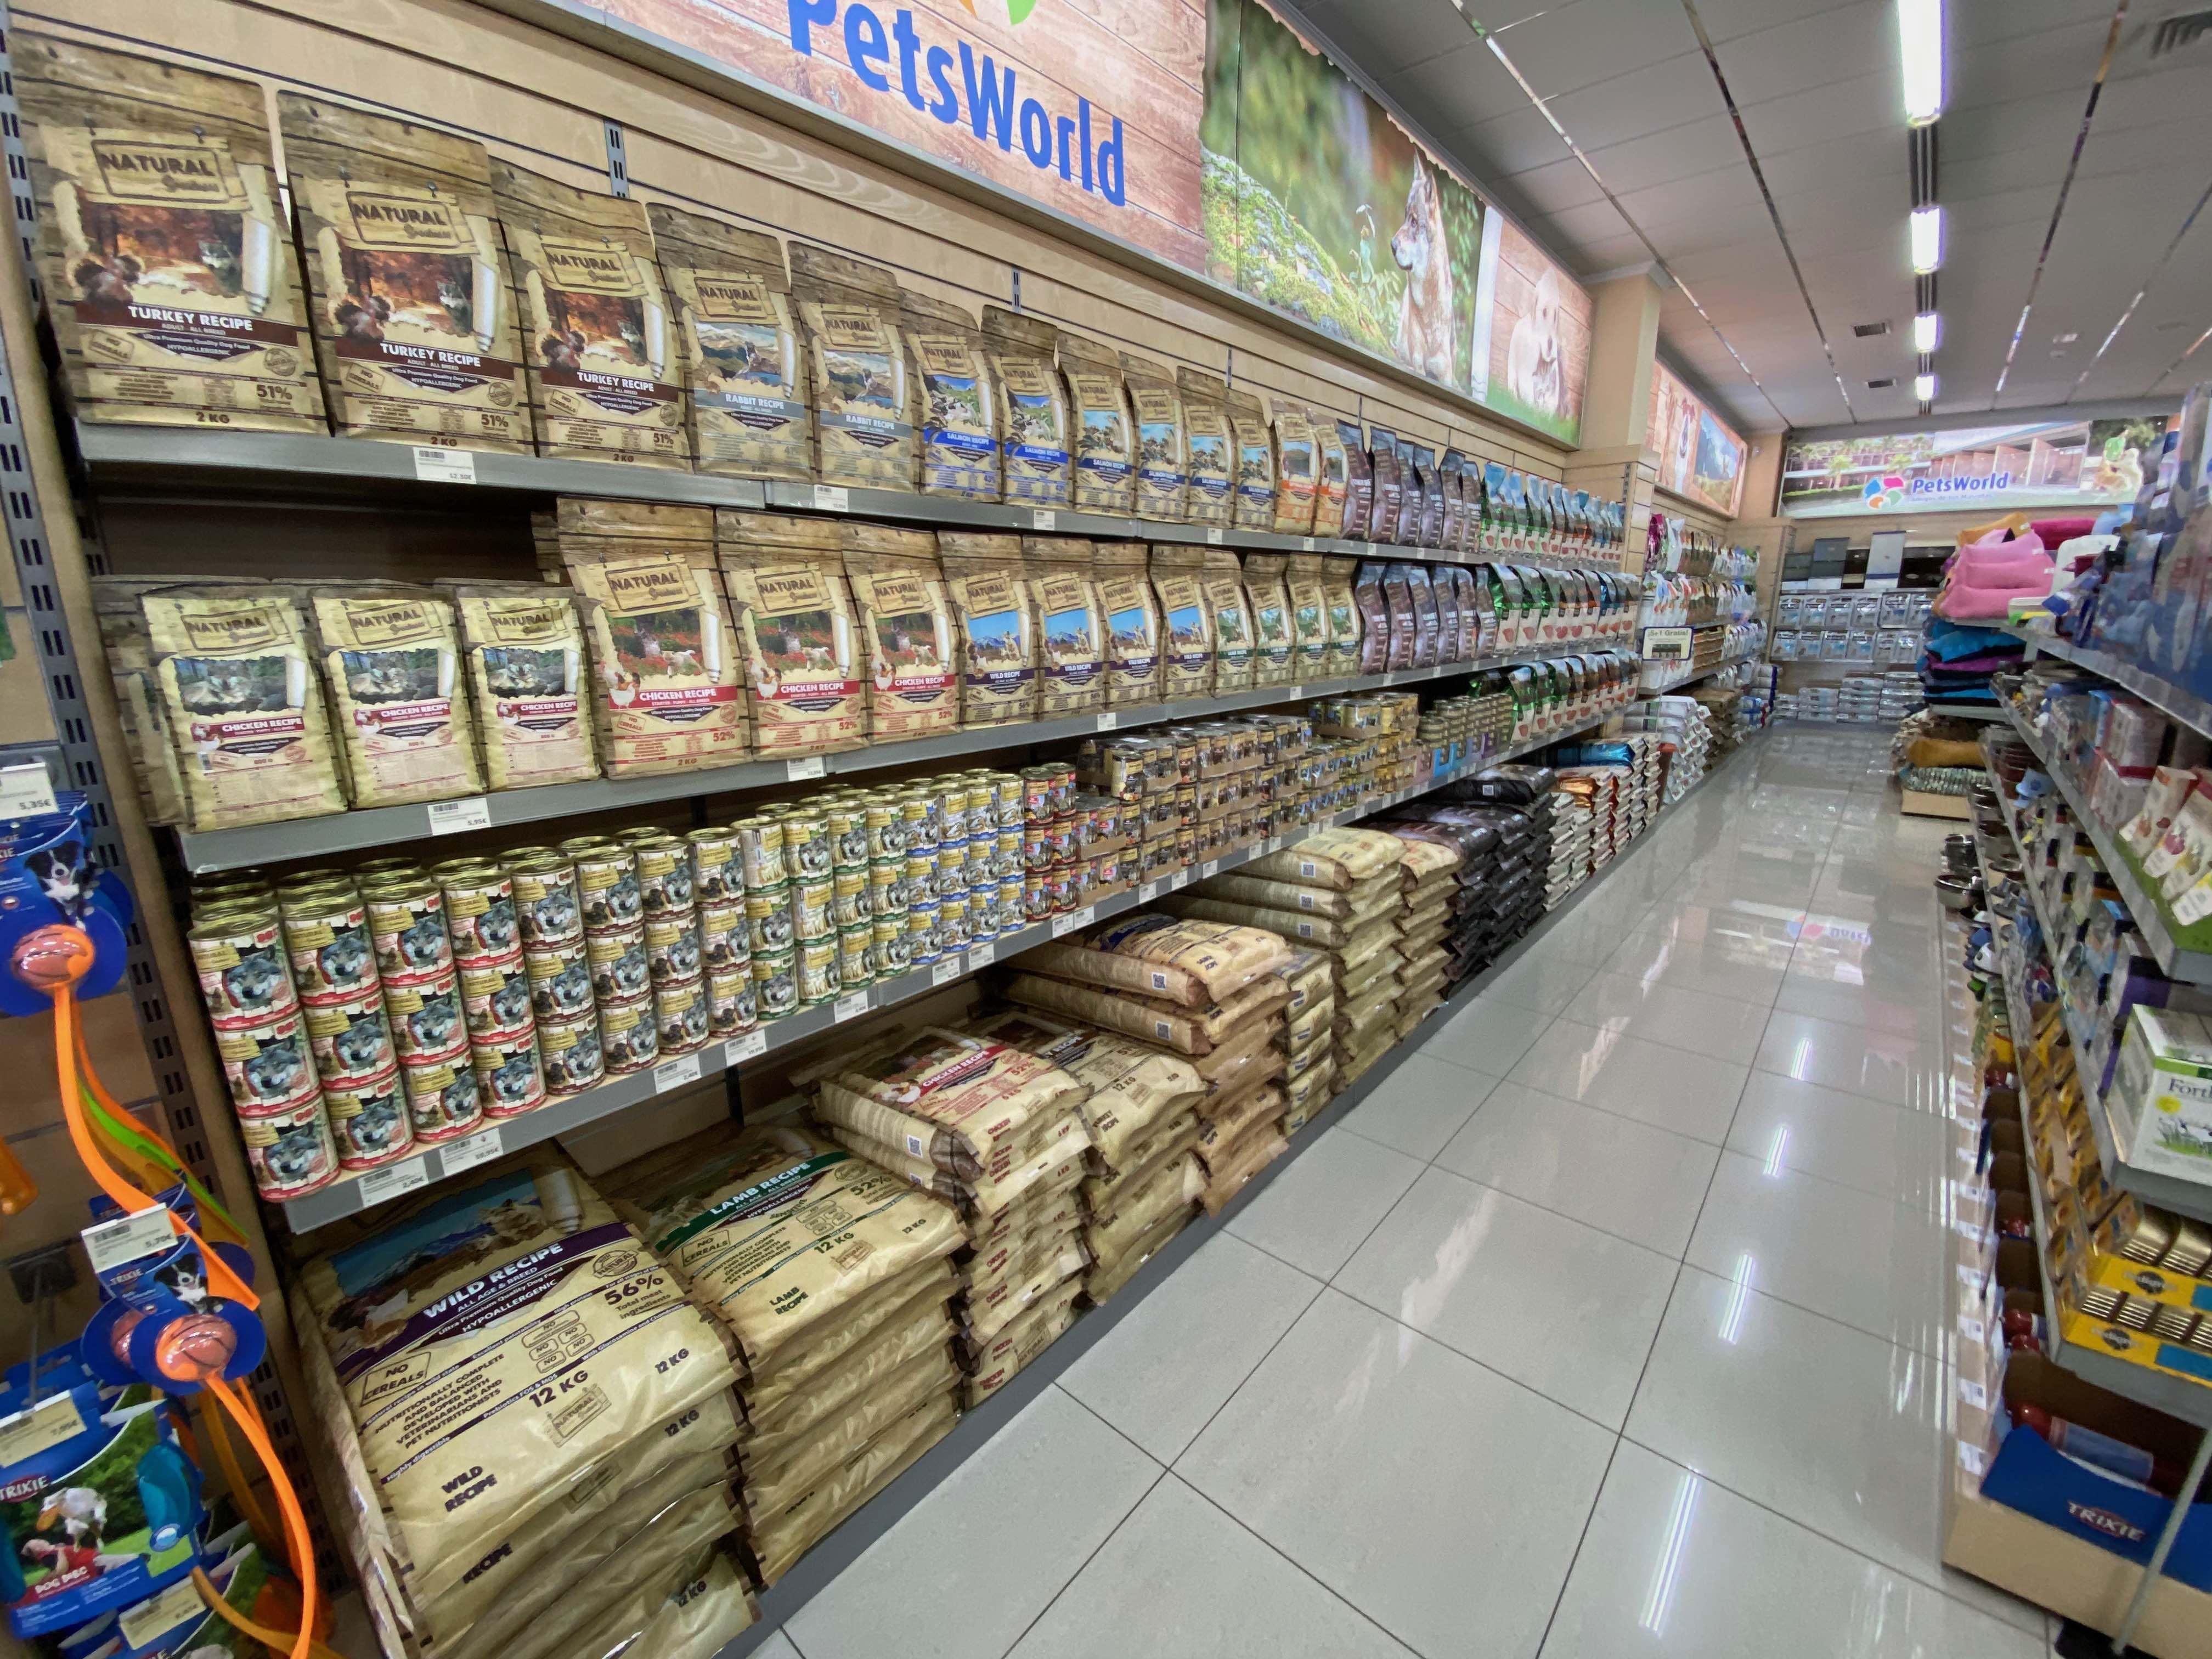 Tienda Petsworld interior